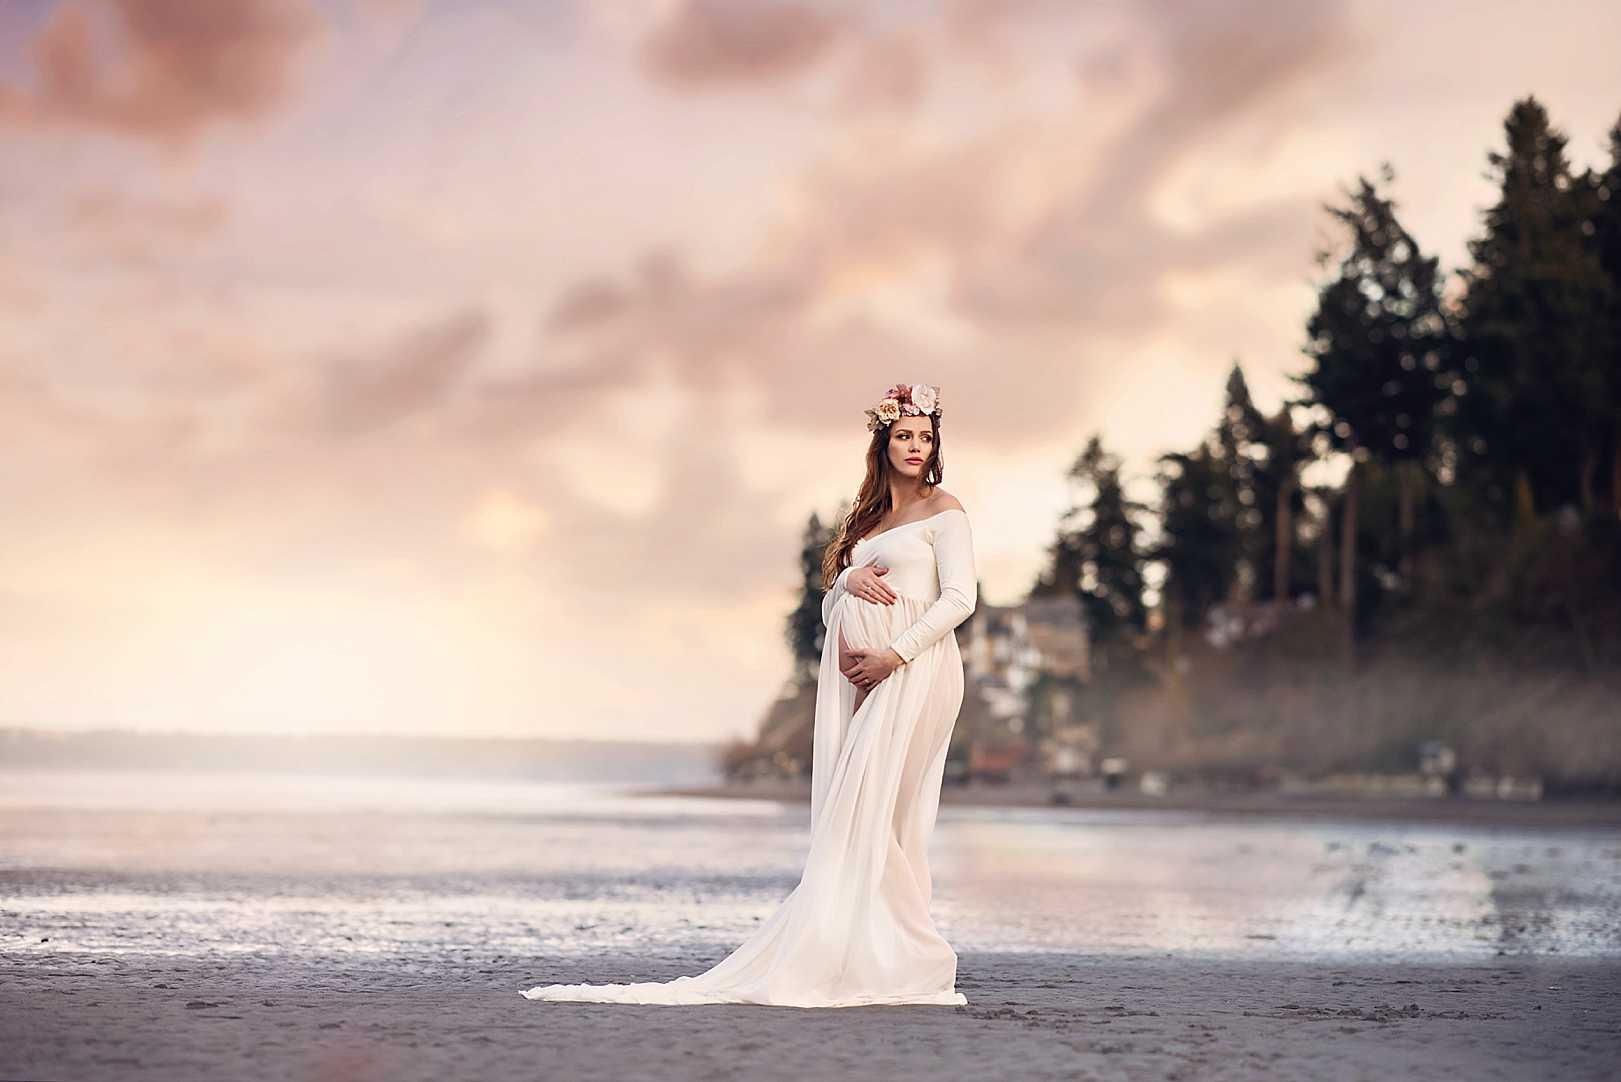 JBLM Maternity Photographer | Stephanie Ratto Photography